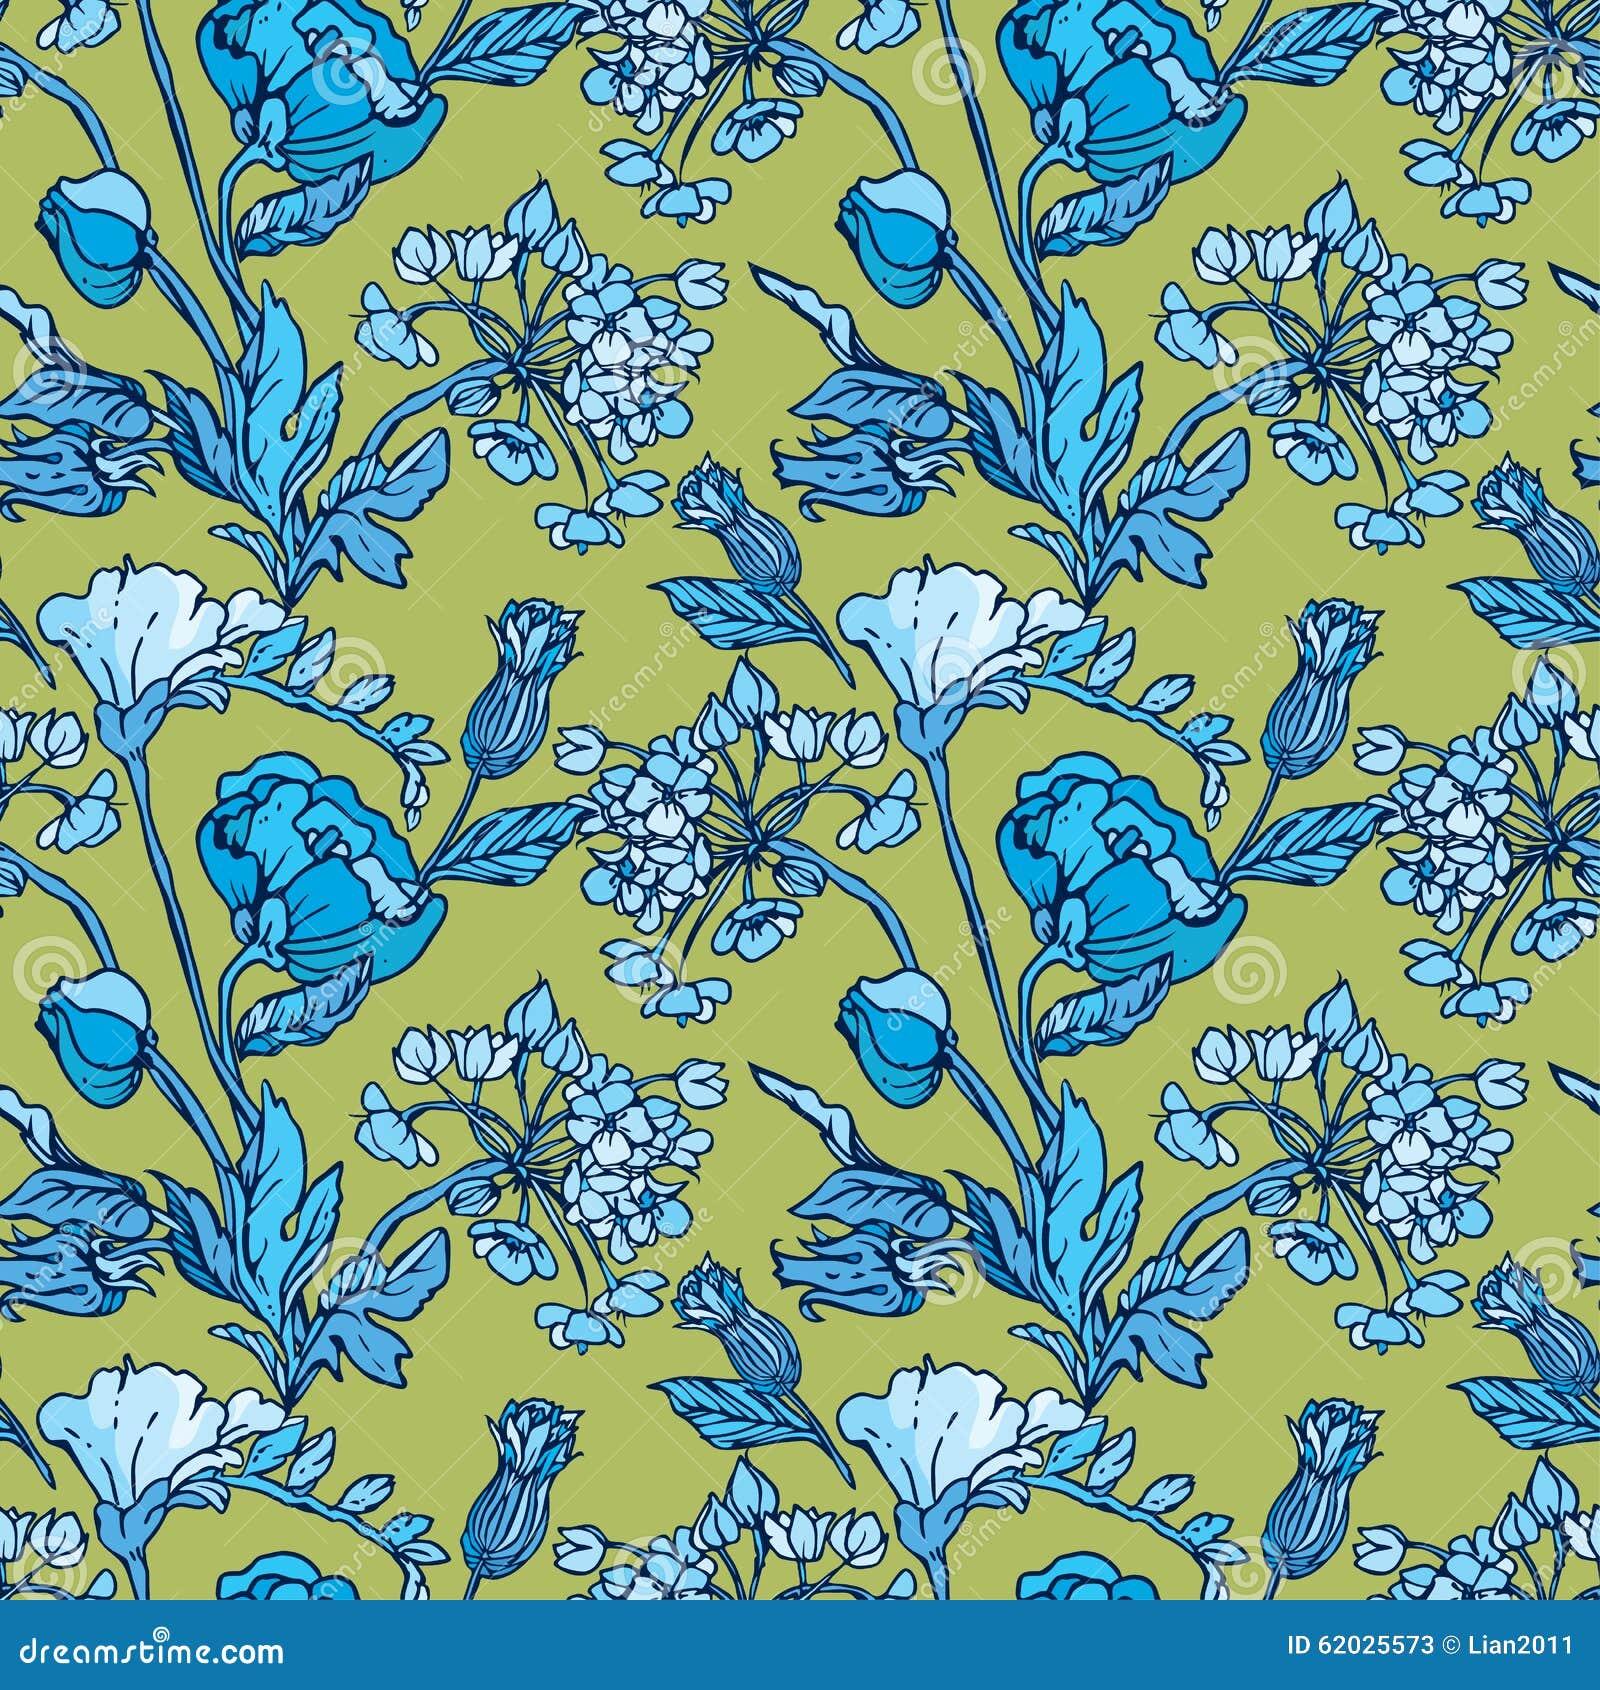 Modelo inconsútil con las flores - amapola y guisante de olor en colo azul